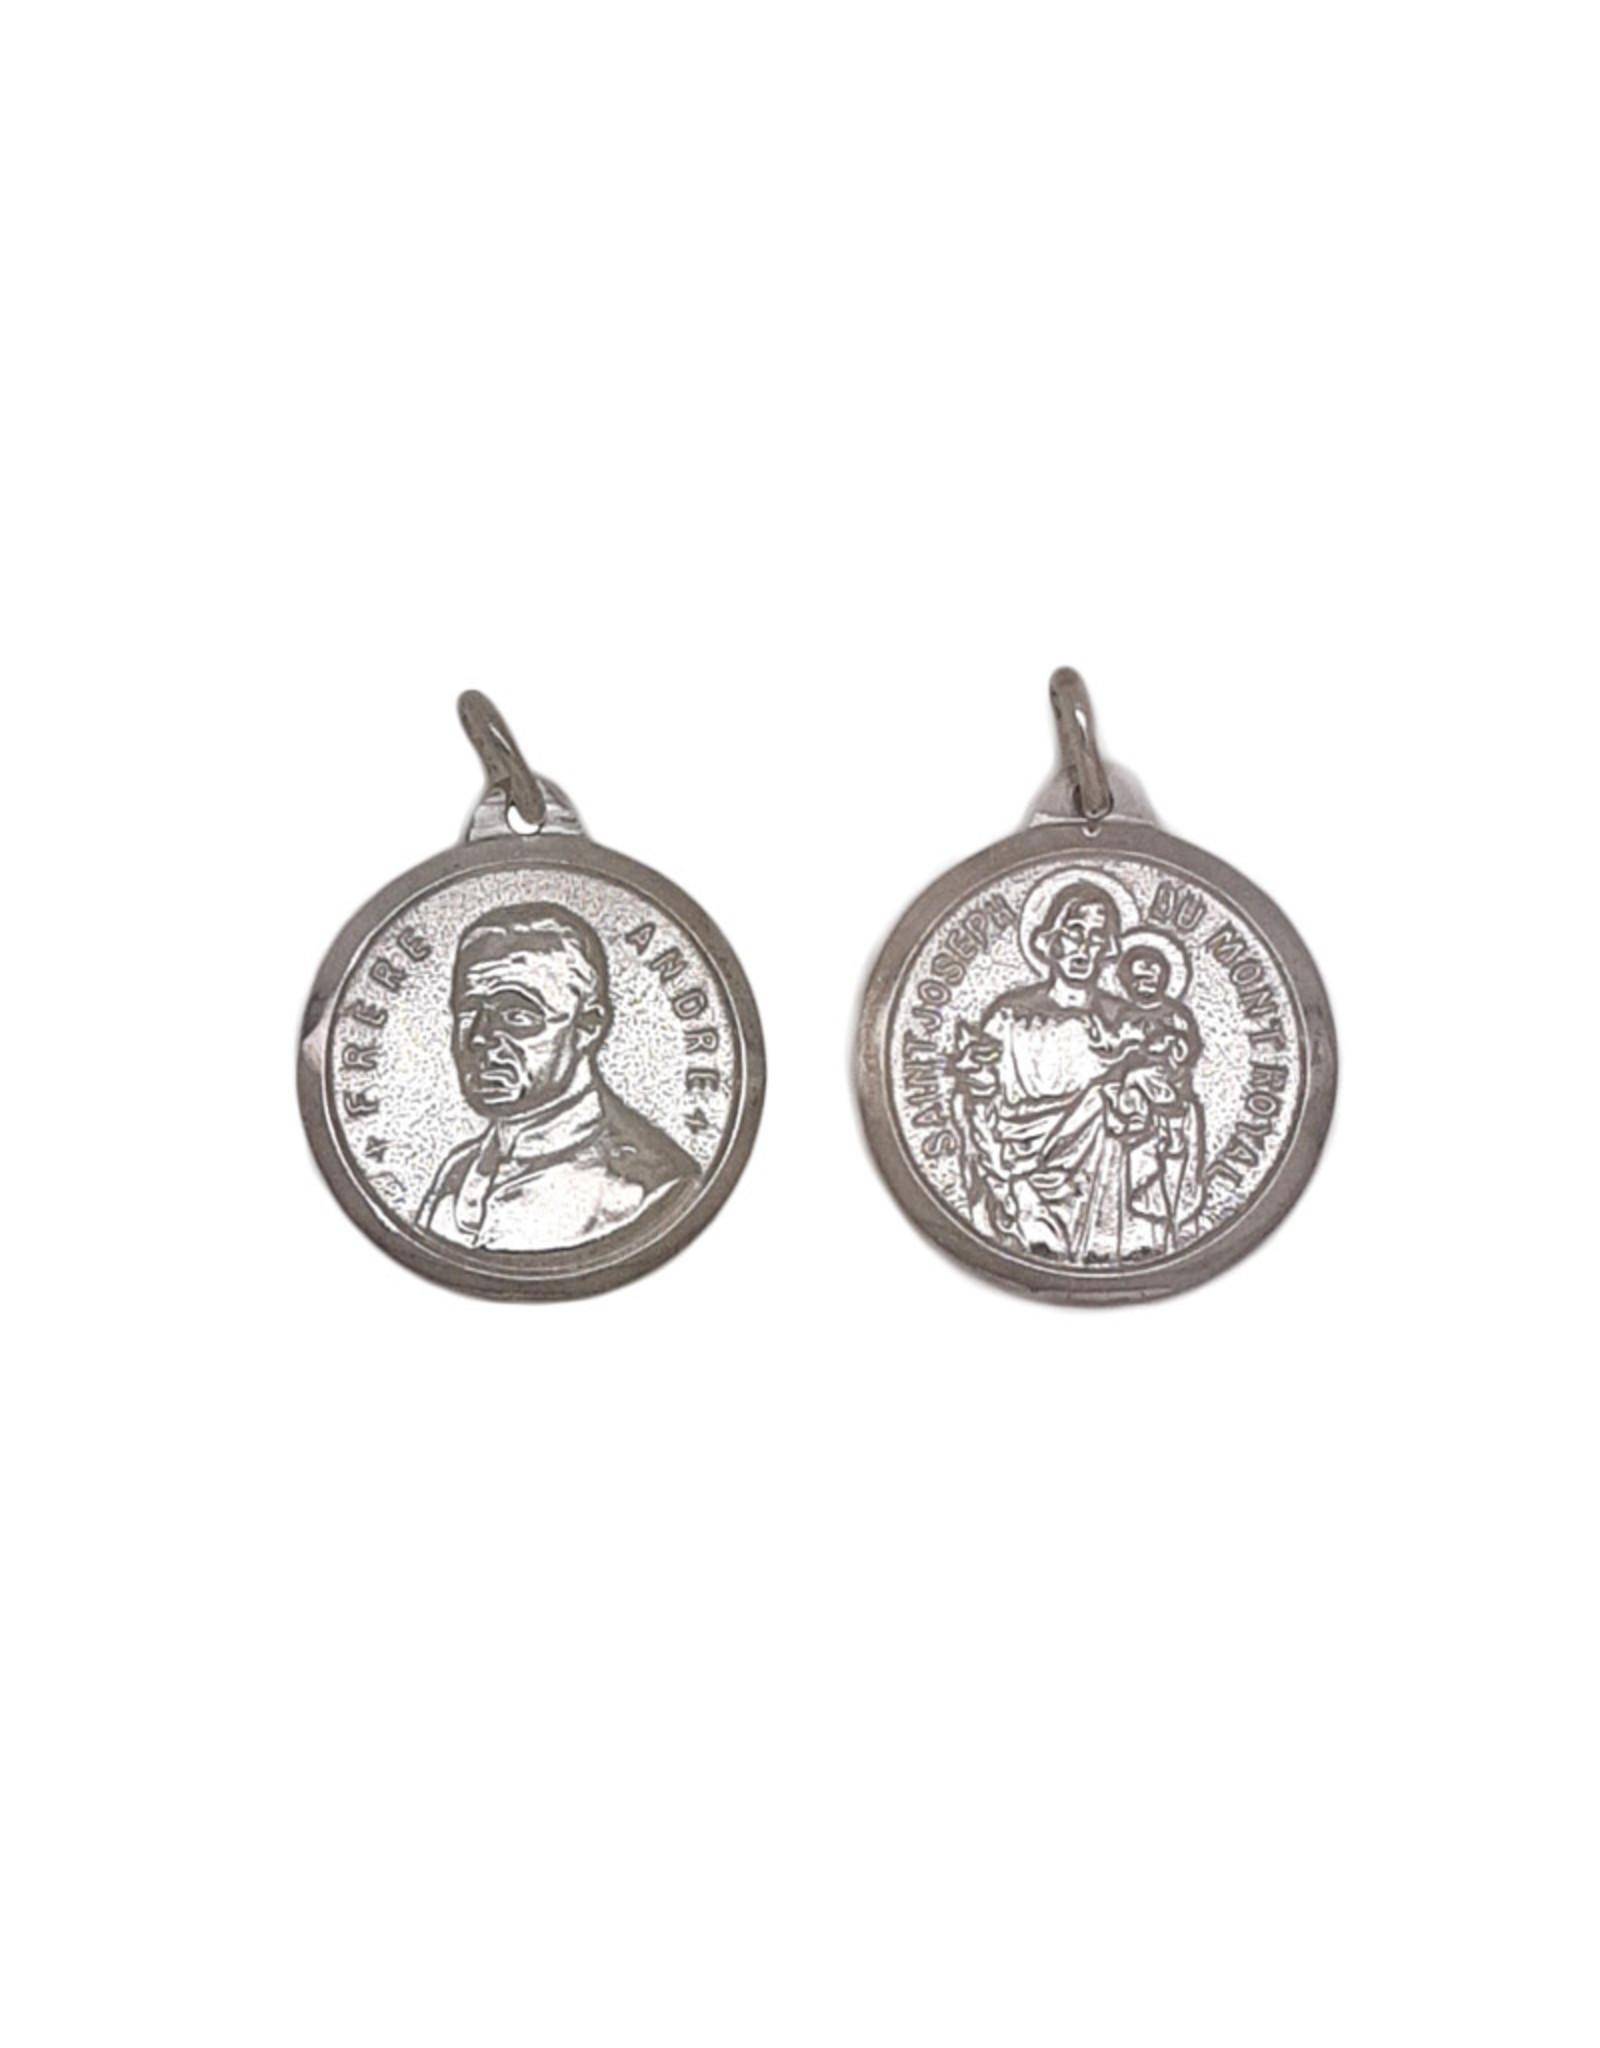 Saint Brother André / Saint Joseph medal, sterling silver (25mm)